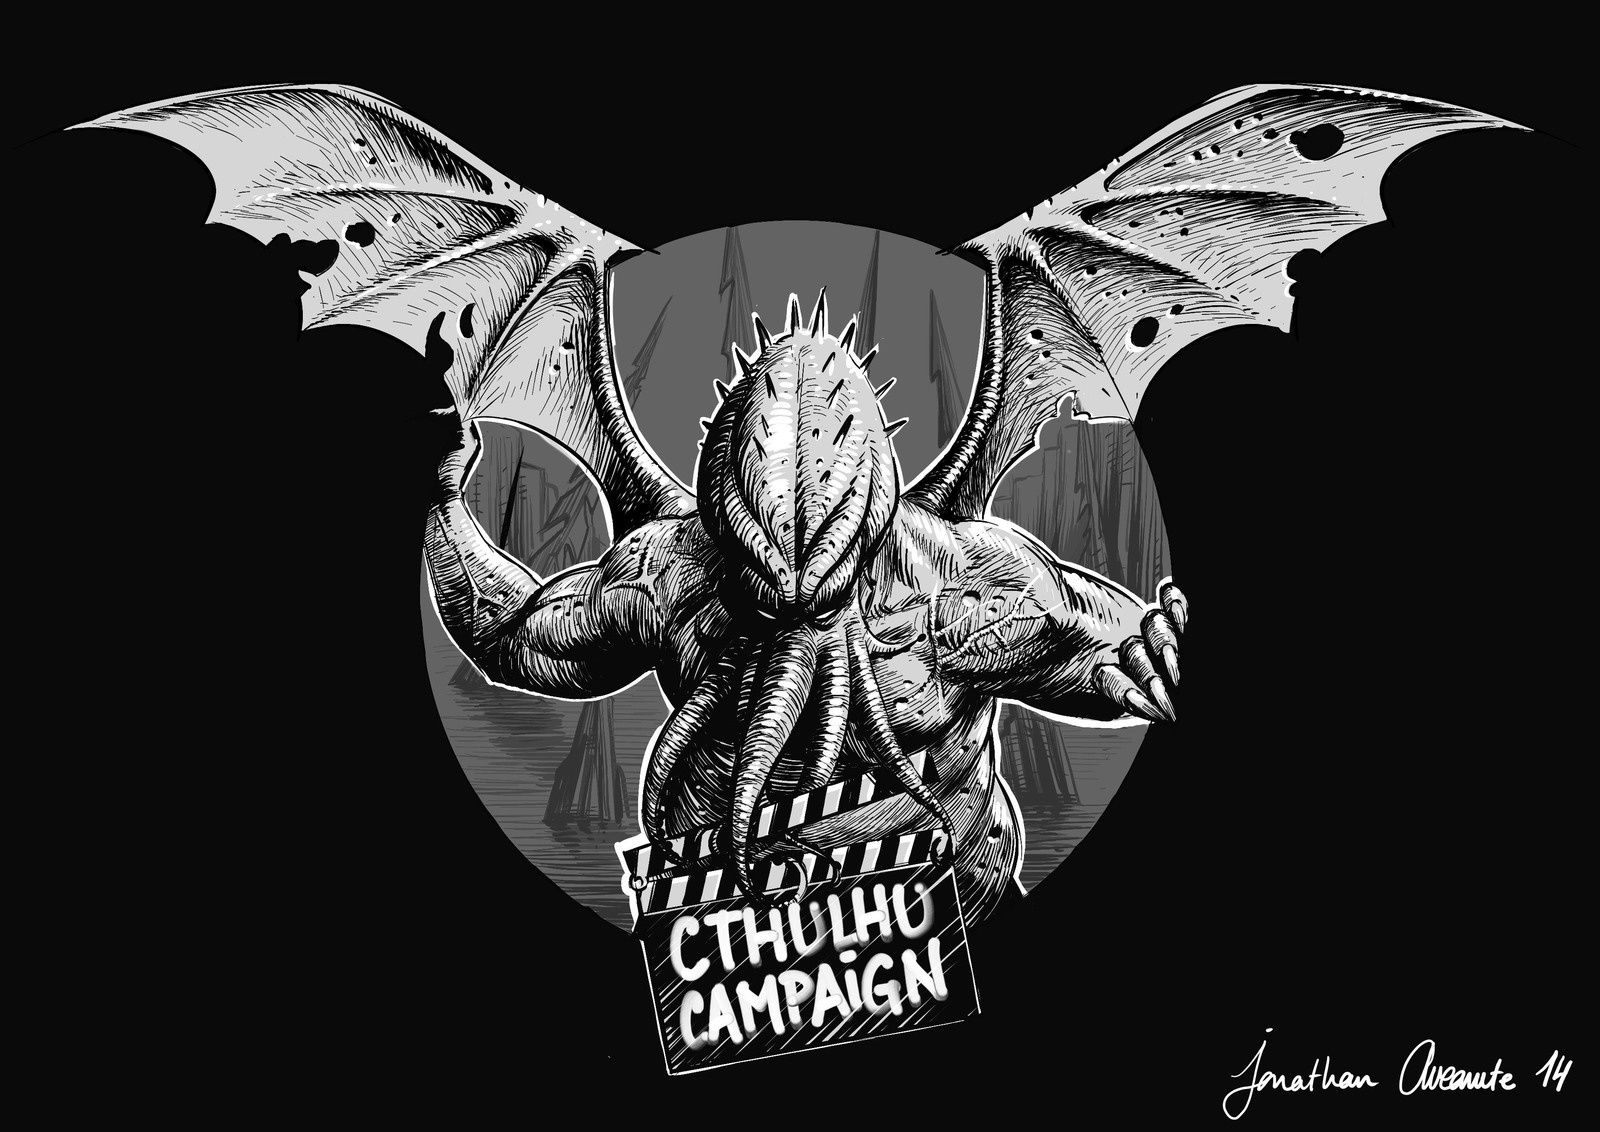 Cthulhu movie campaign logo